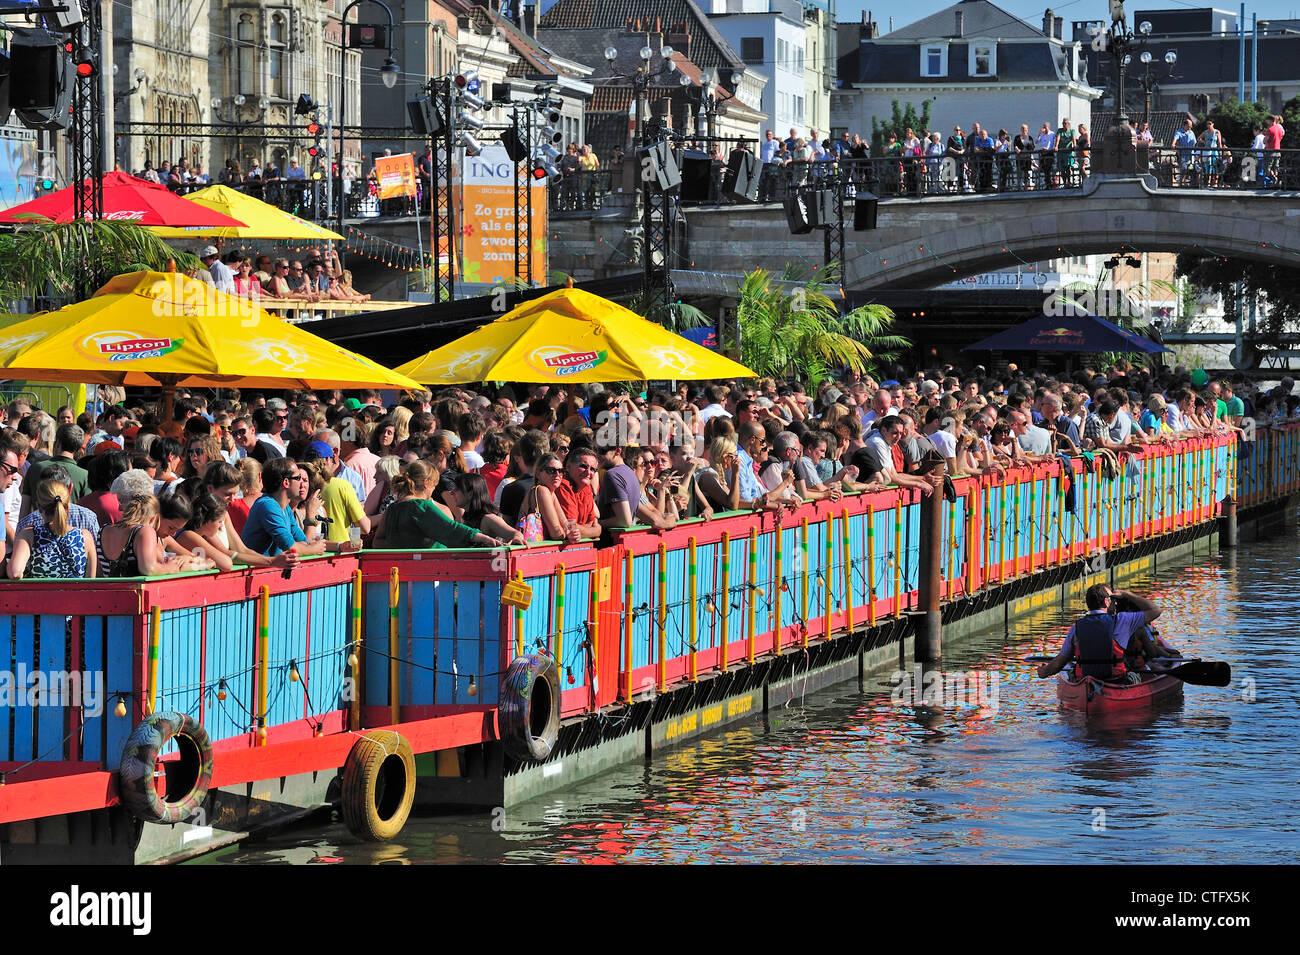 Spectators looking at animation at the Gentse Feesten / Ghent Festivities in summer, Belgium - Stock Image